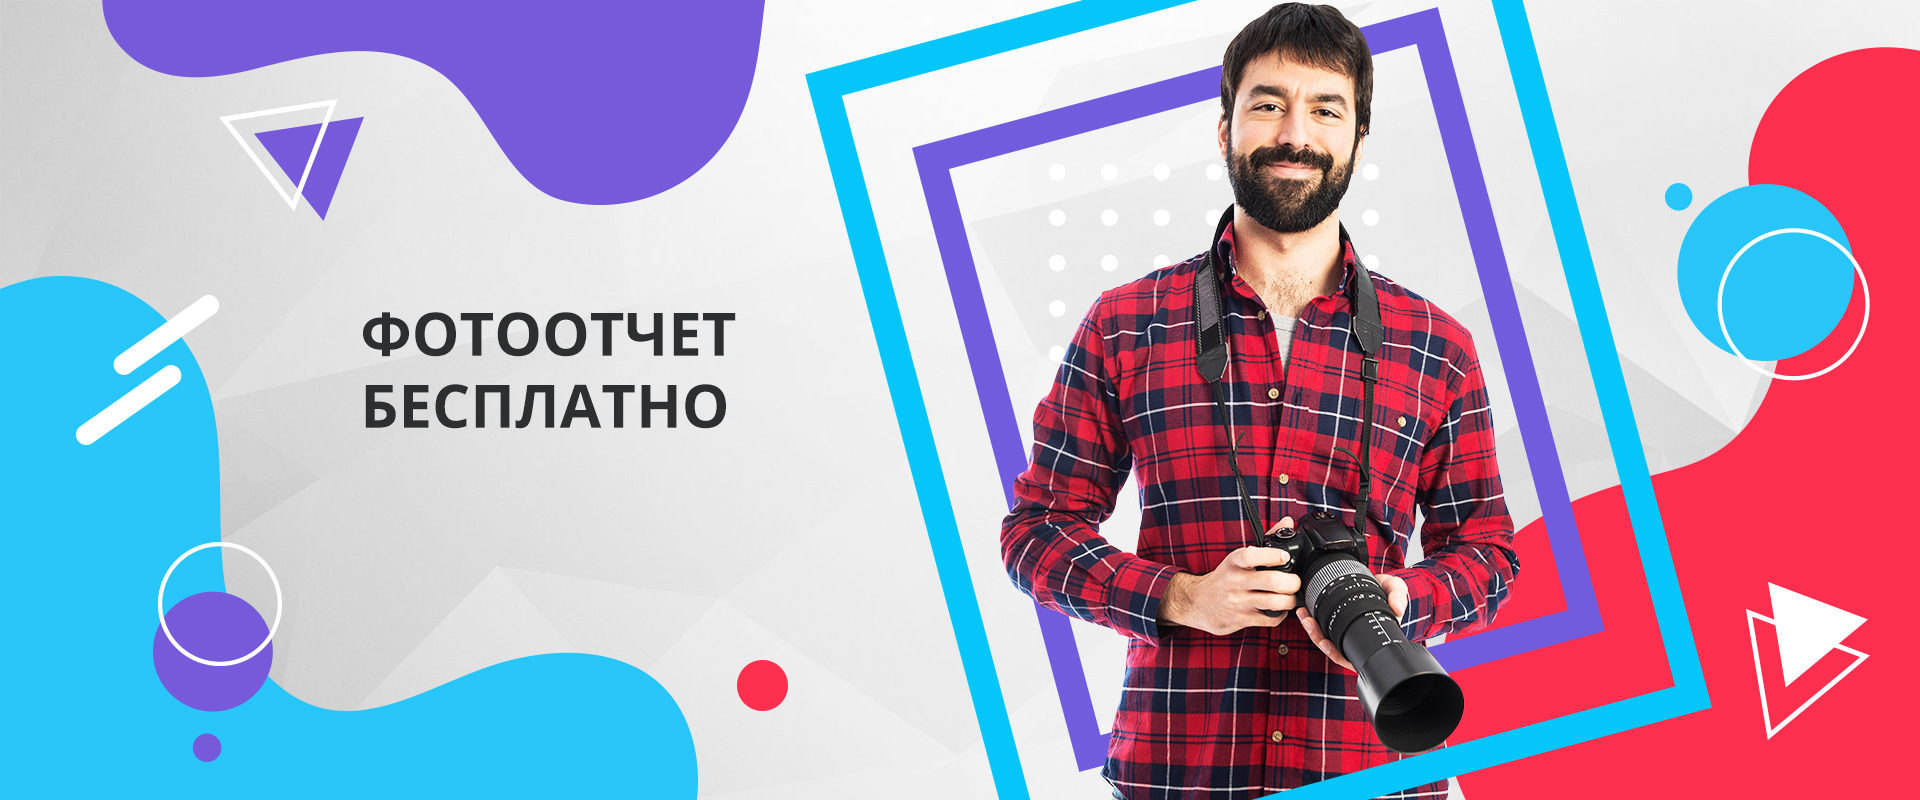 Реклама в гродно фотоотчёт